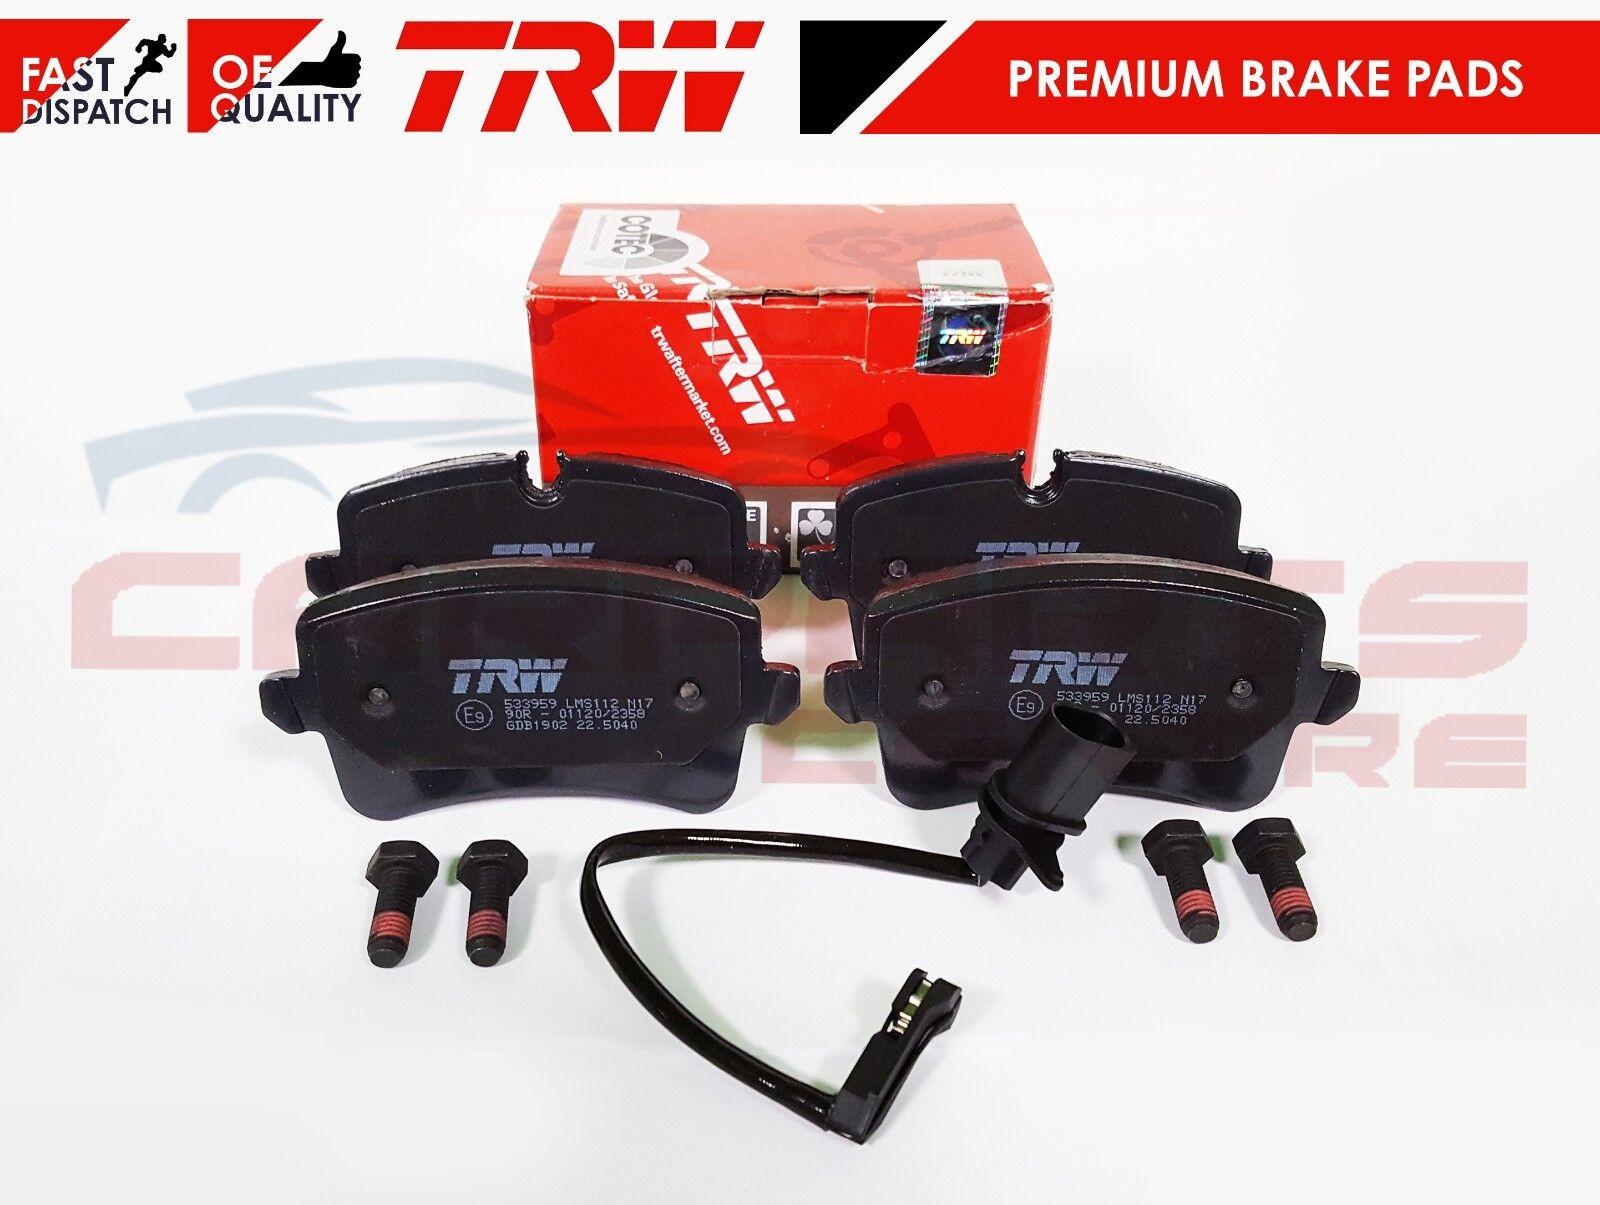 Audi A4 B8 2.0 TDI Genuine TRW Rear Brake Pads Set